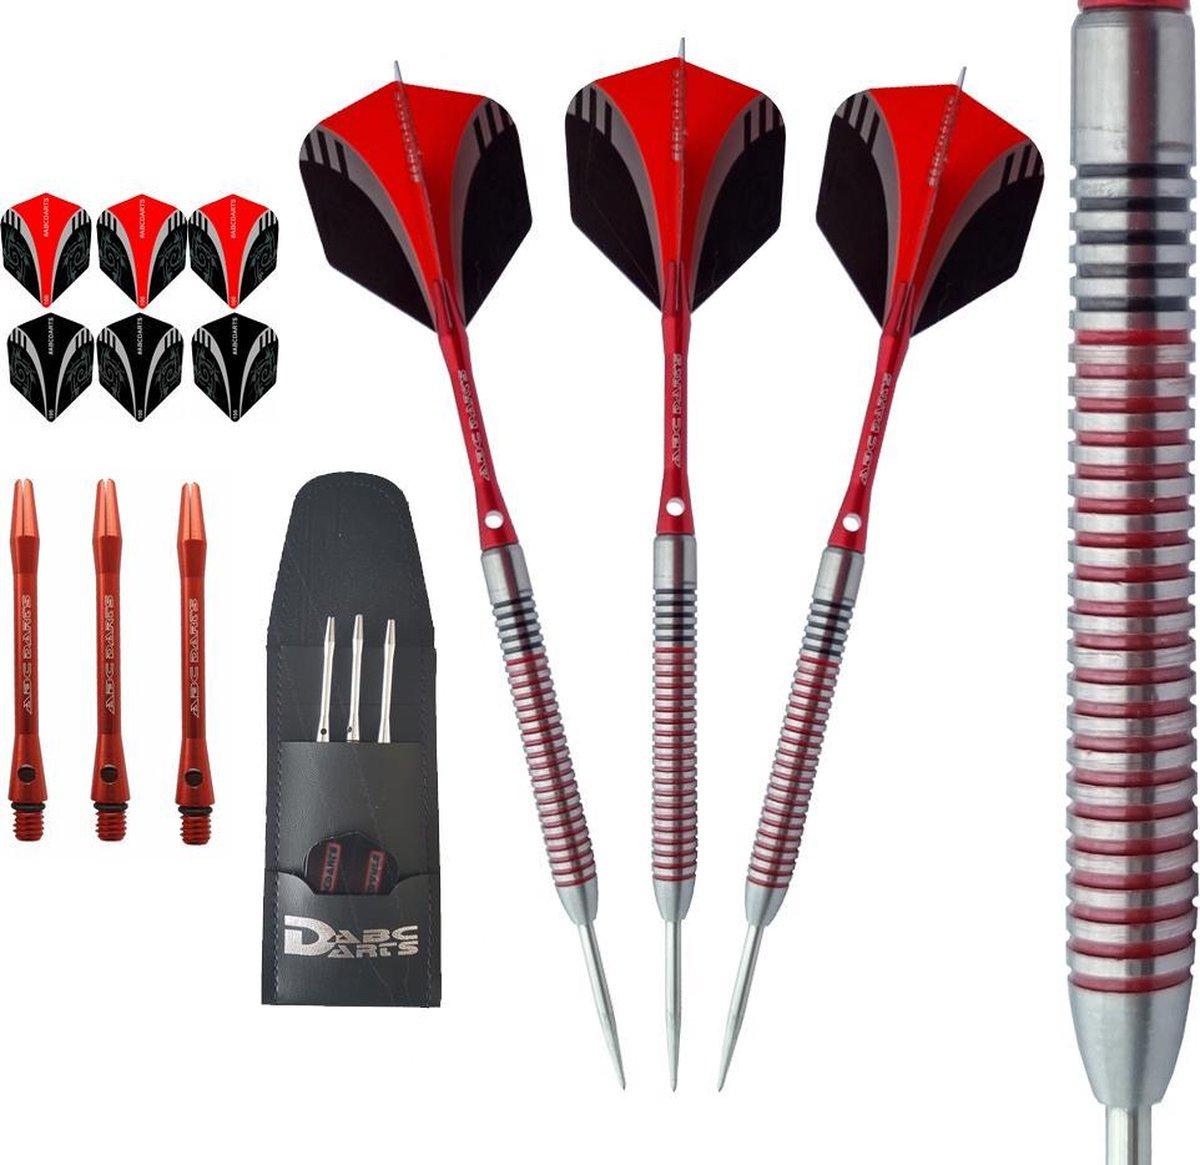 ABC Darts Professionele Dartpijlen - Red Dragonas Multi Ring - 26 gram